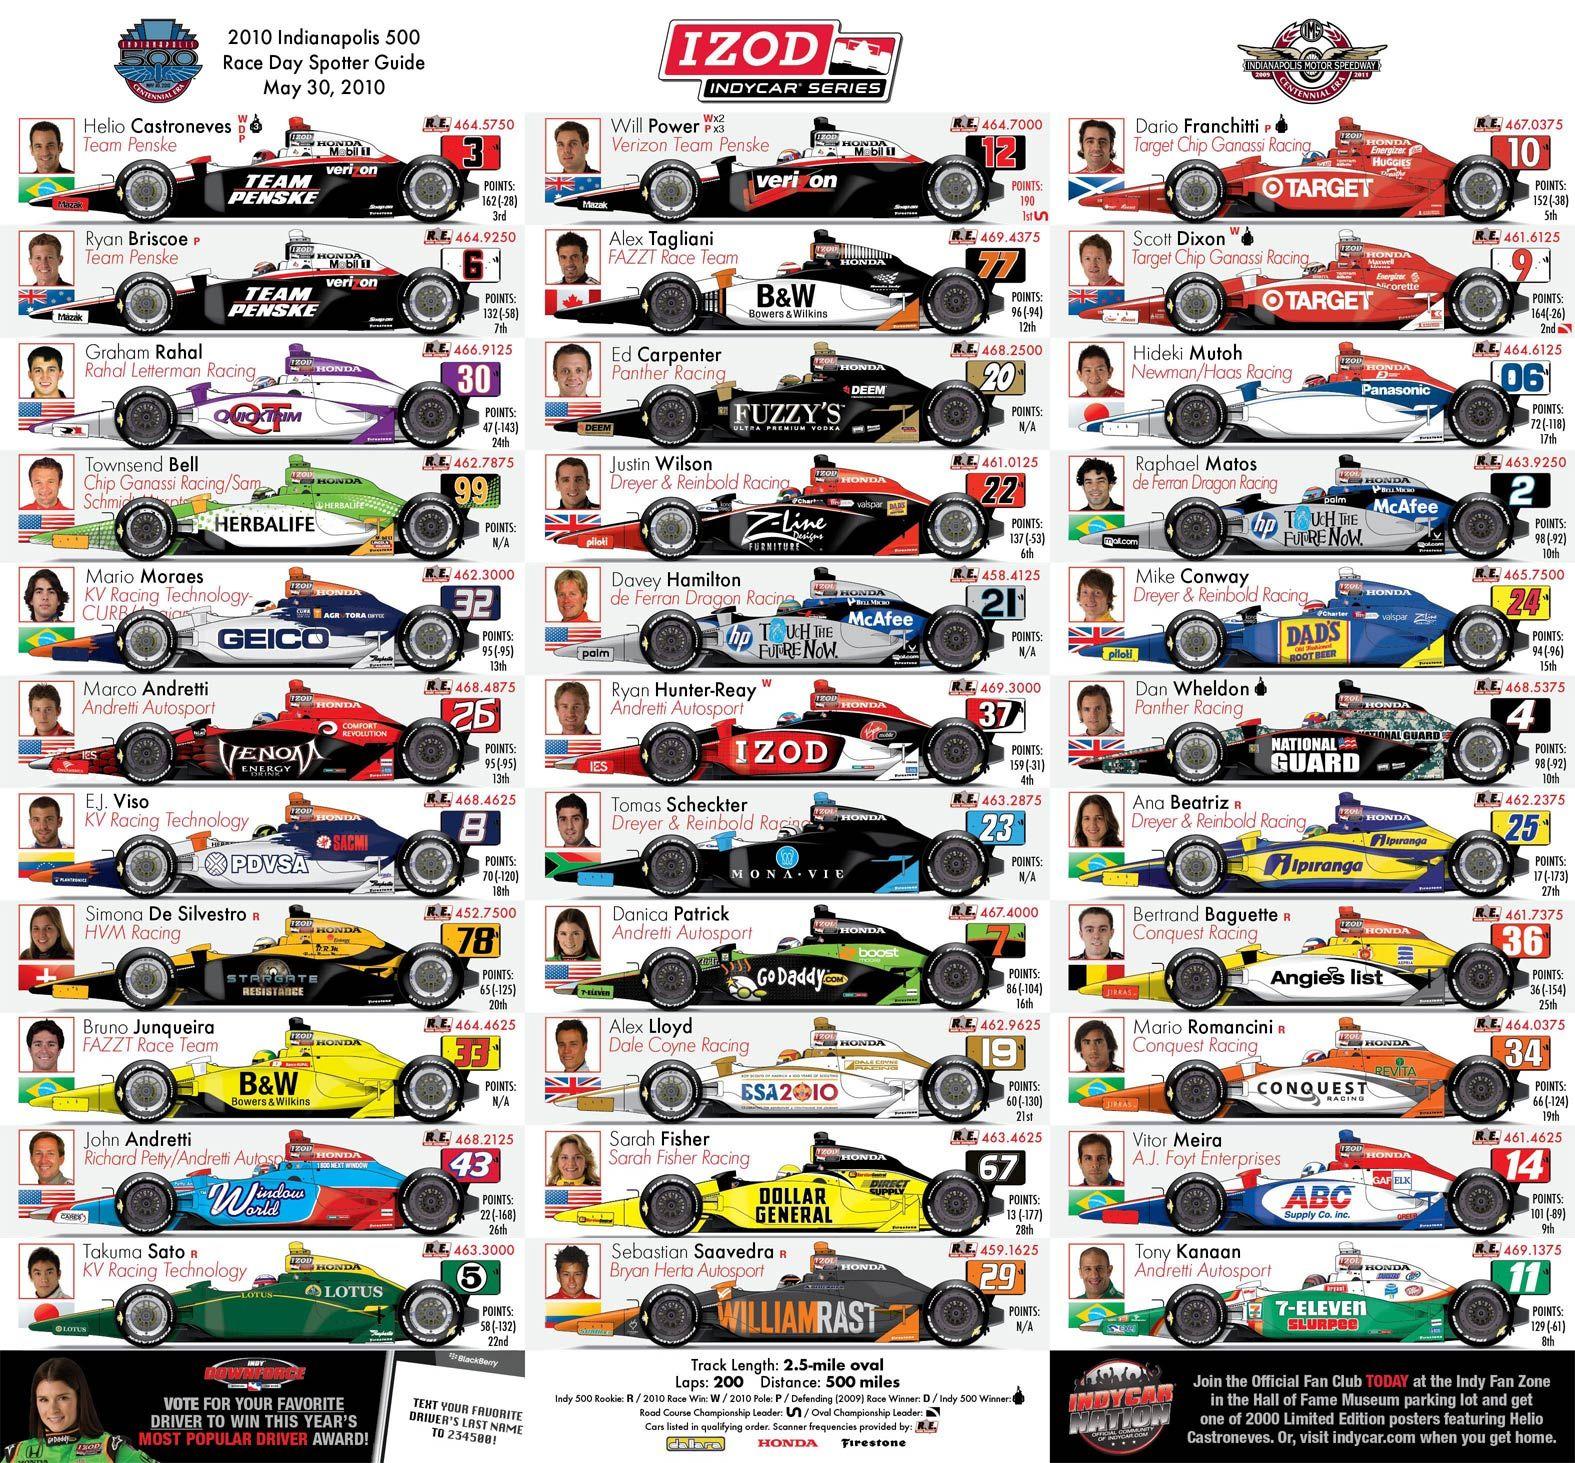 formula 1 champion in 2009